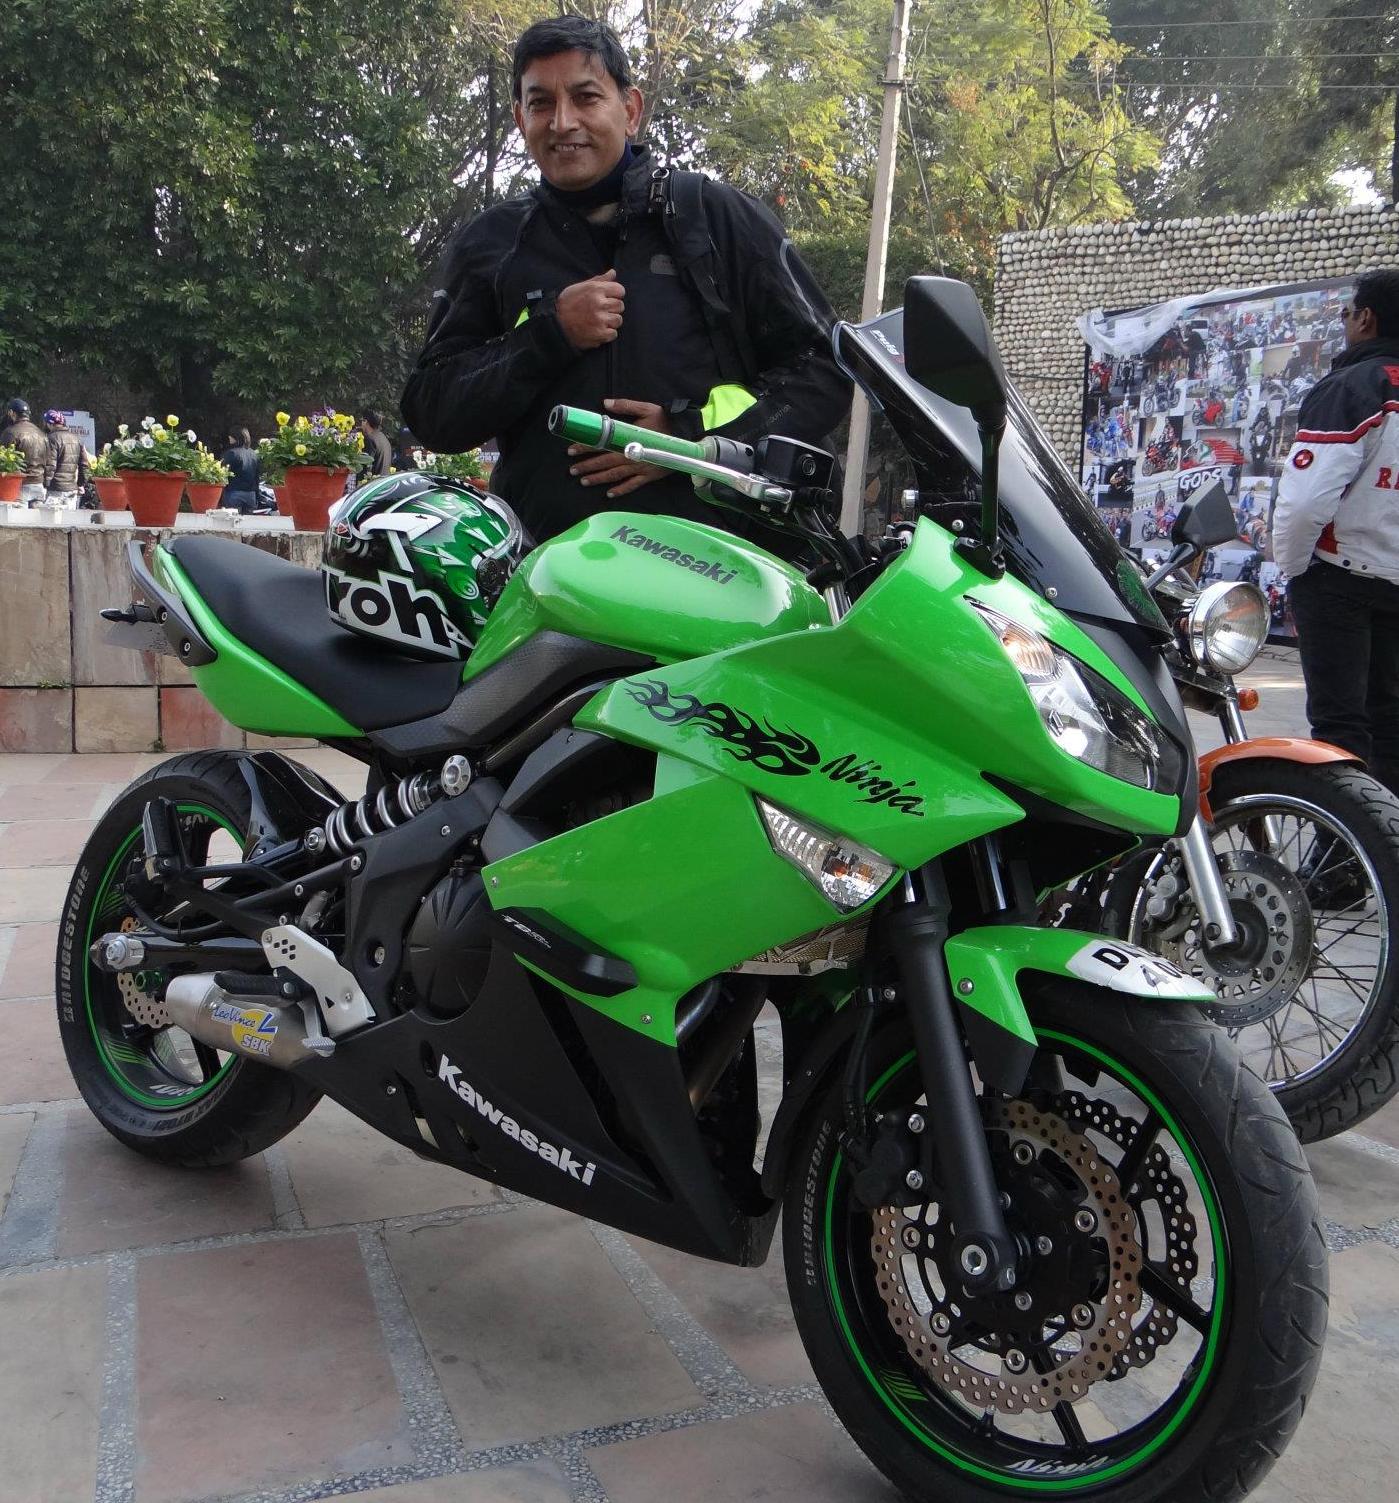 Life With A Superbike: 53. Roopak's Kawasaki Ninja 650R, 2011